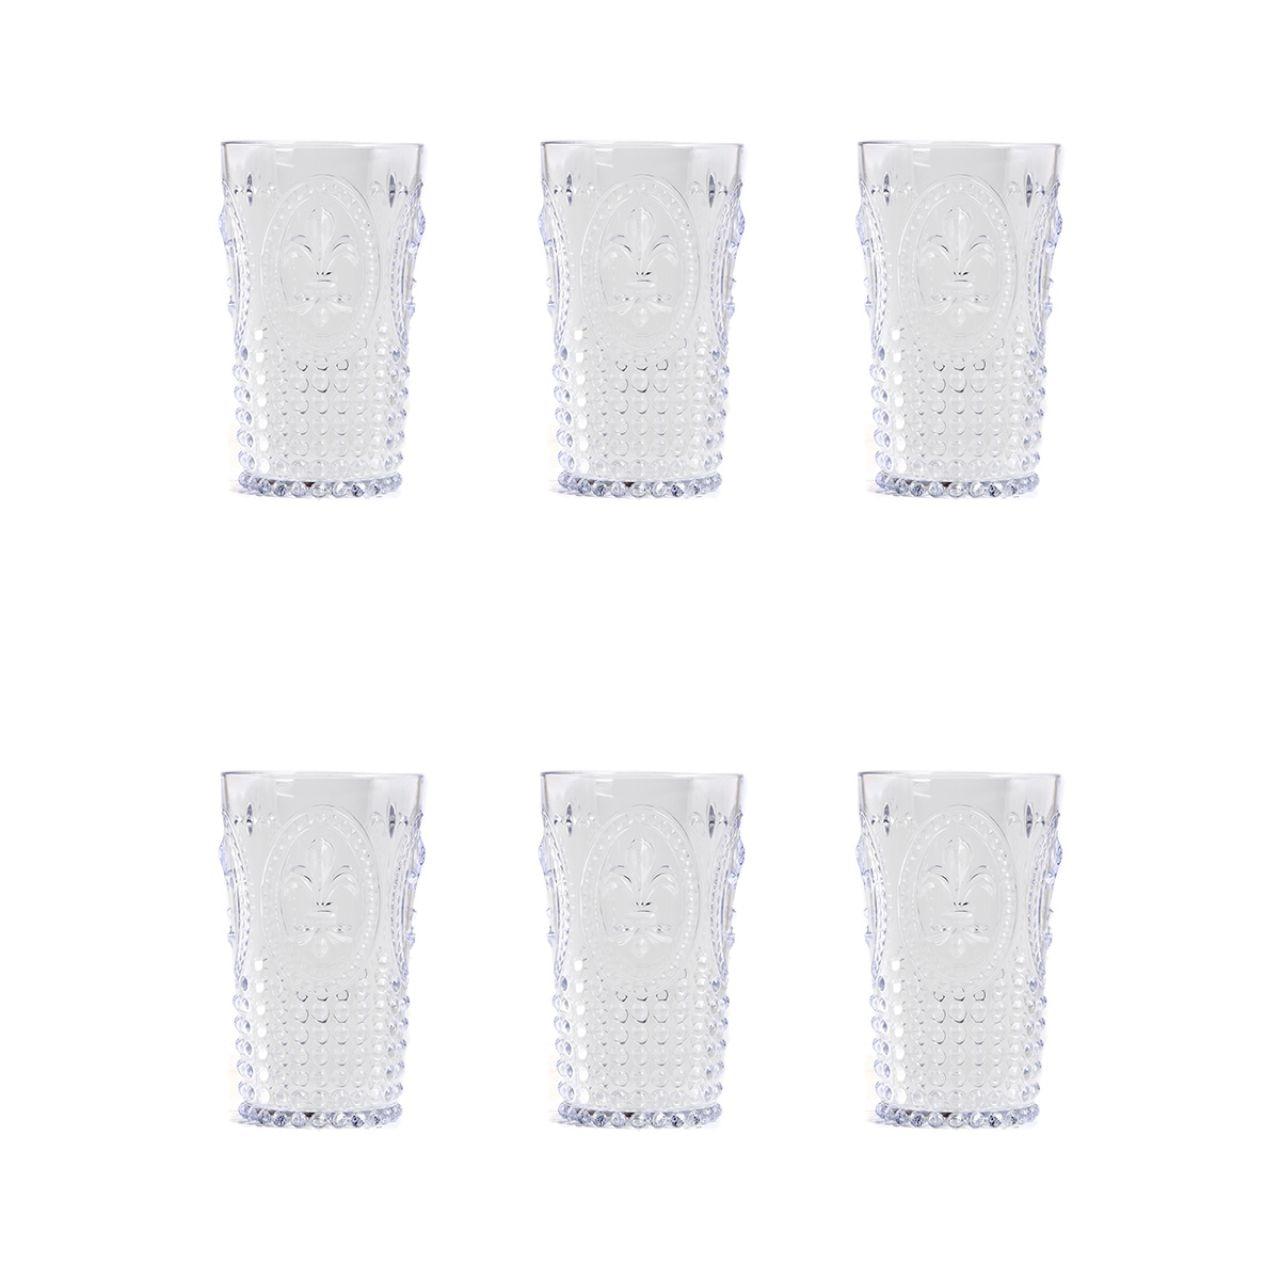 Copo + 3 Acrílico Transparente Copo Longo 3 Presente Ews